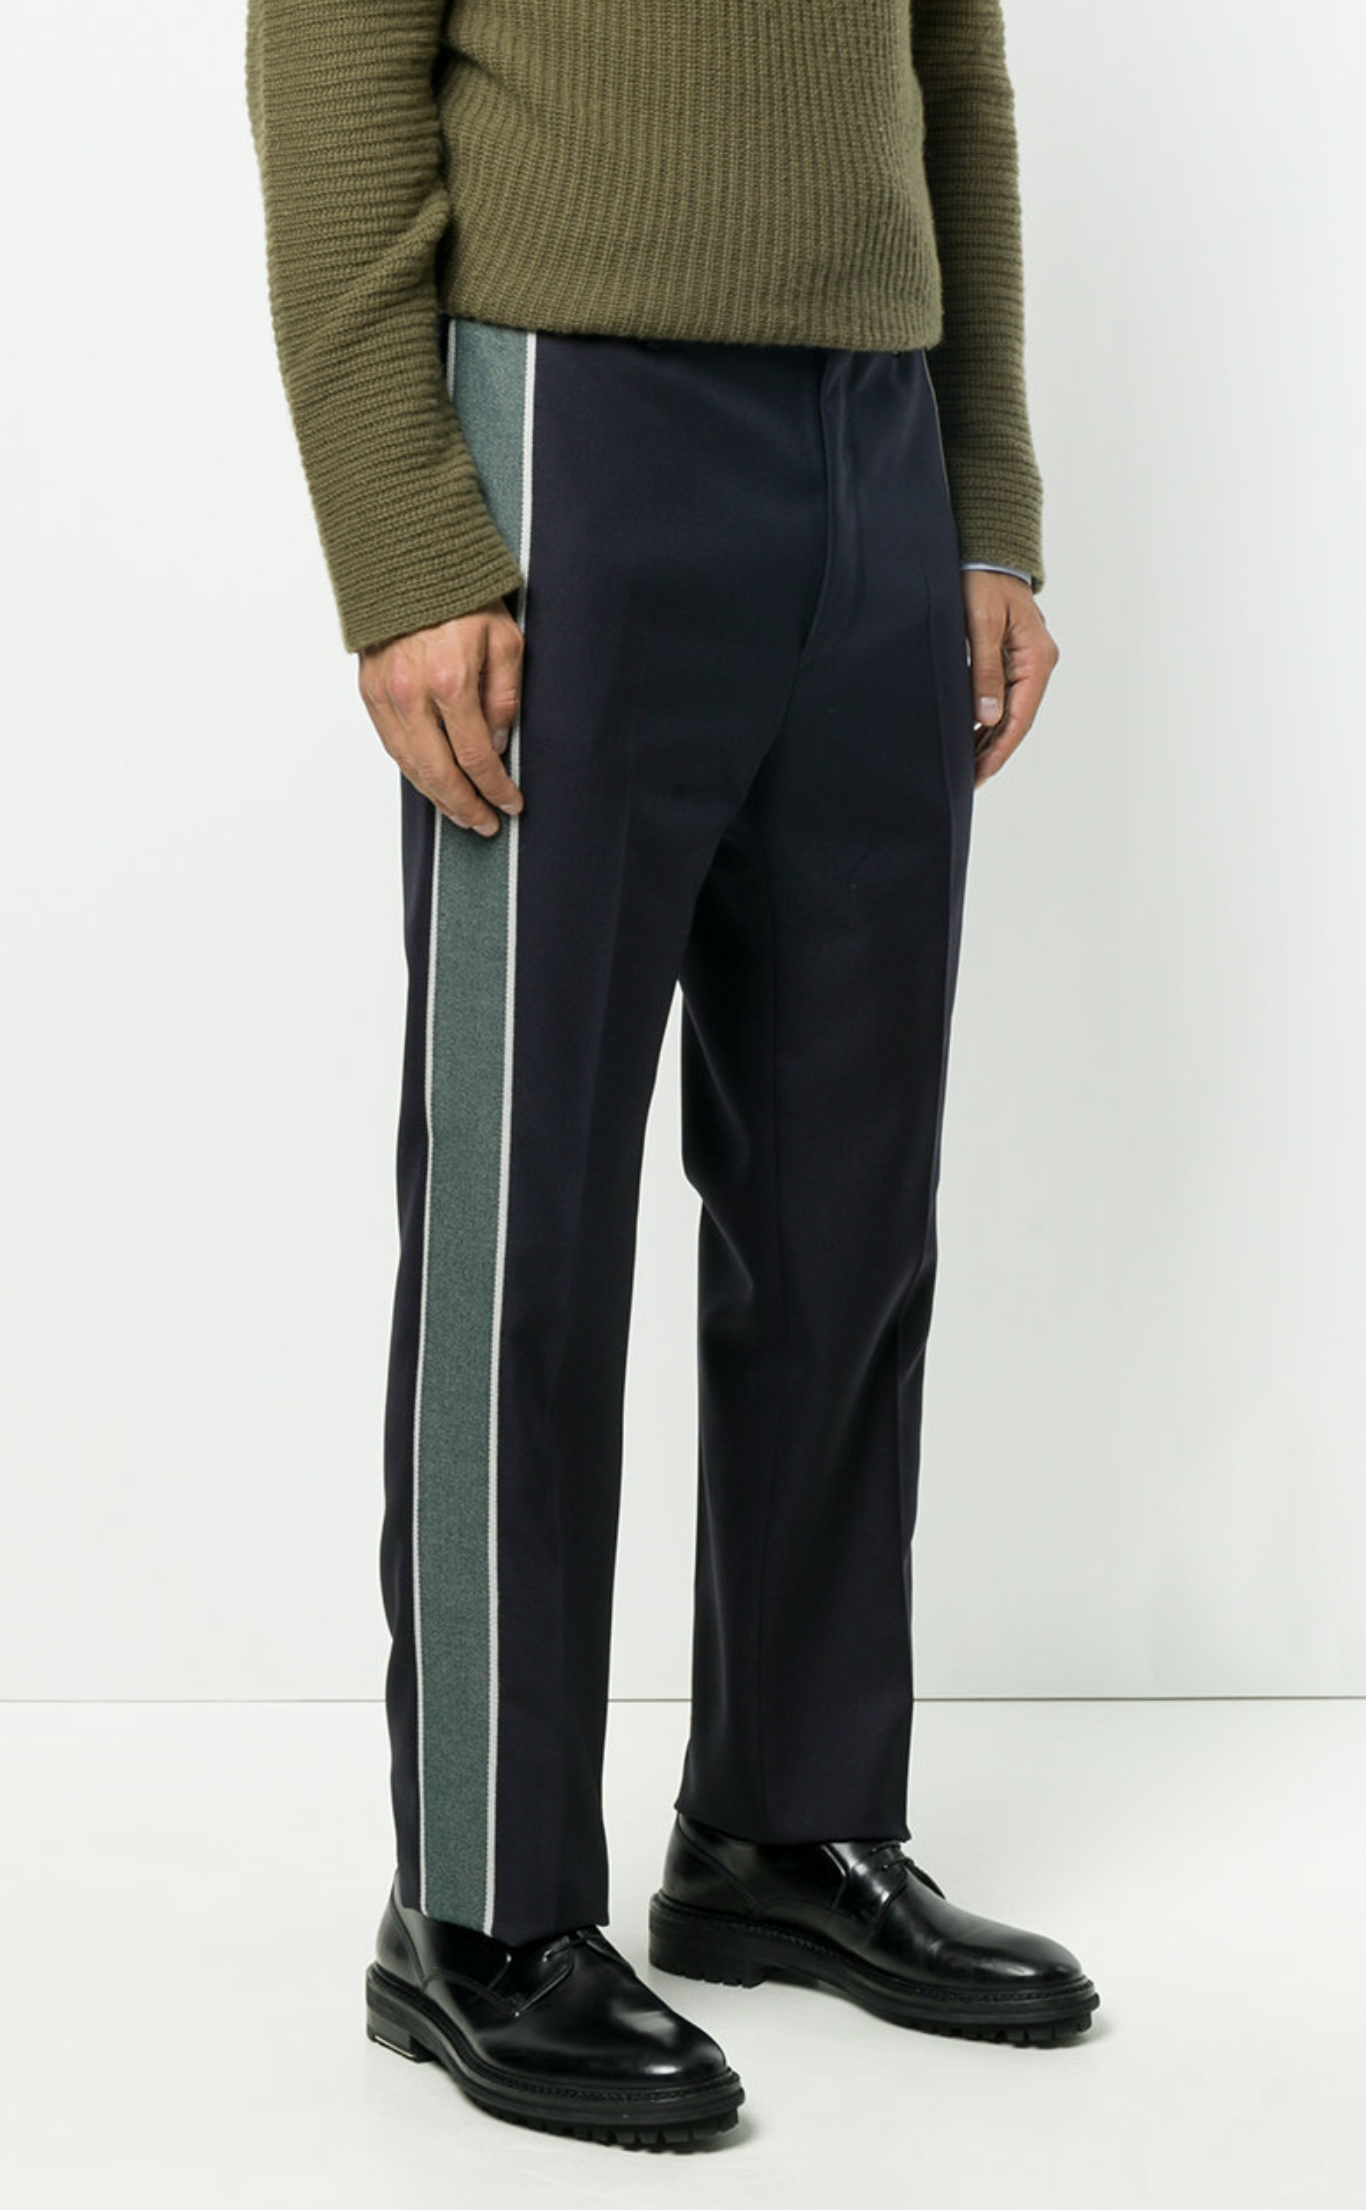 Summer Mens Casual Pants Side Stripe Men's Pants Slim Men